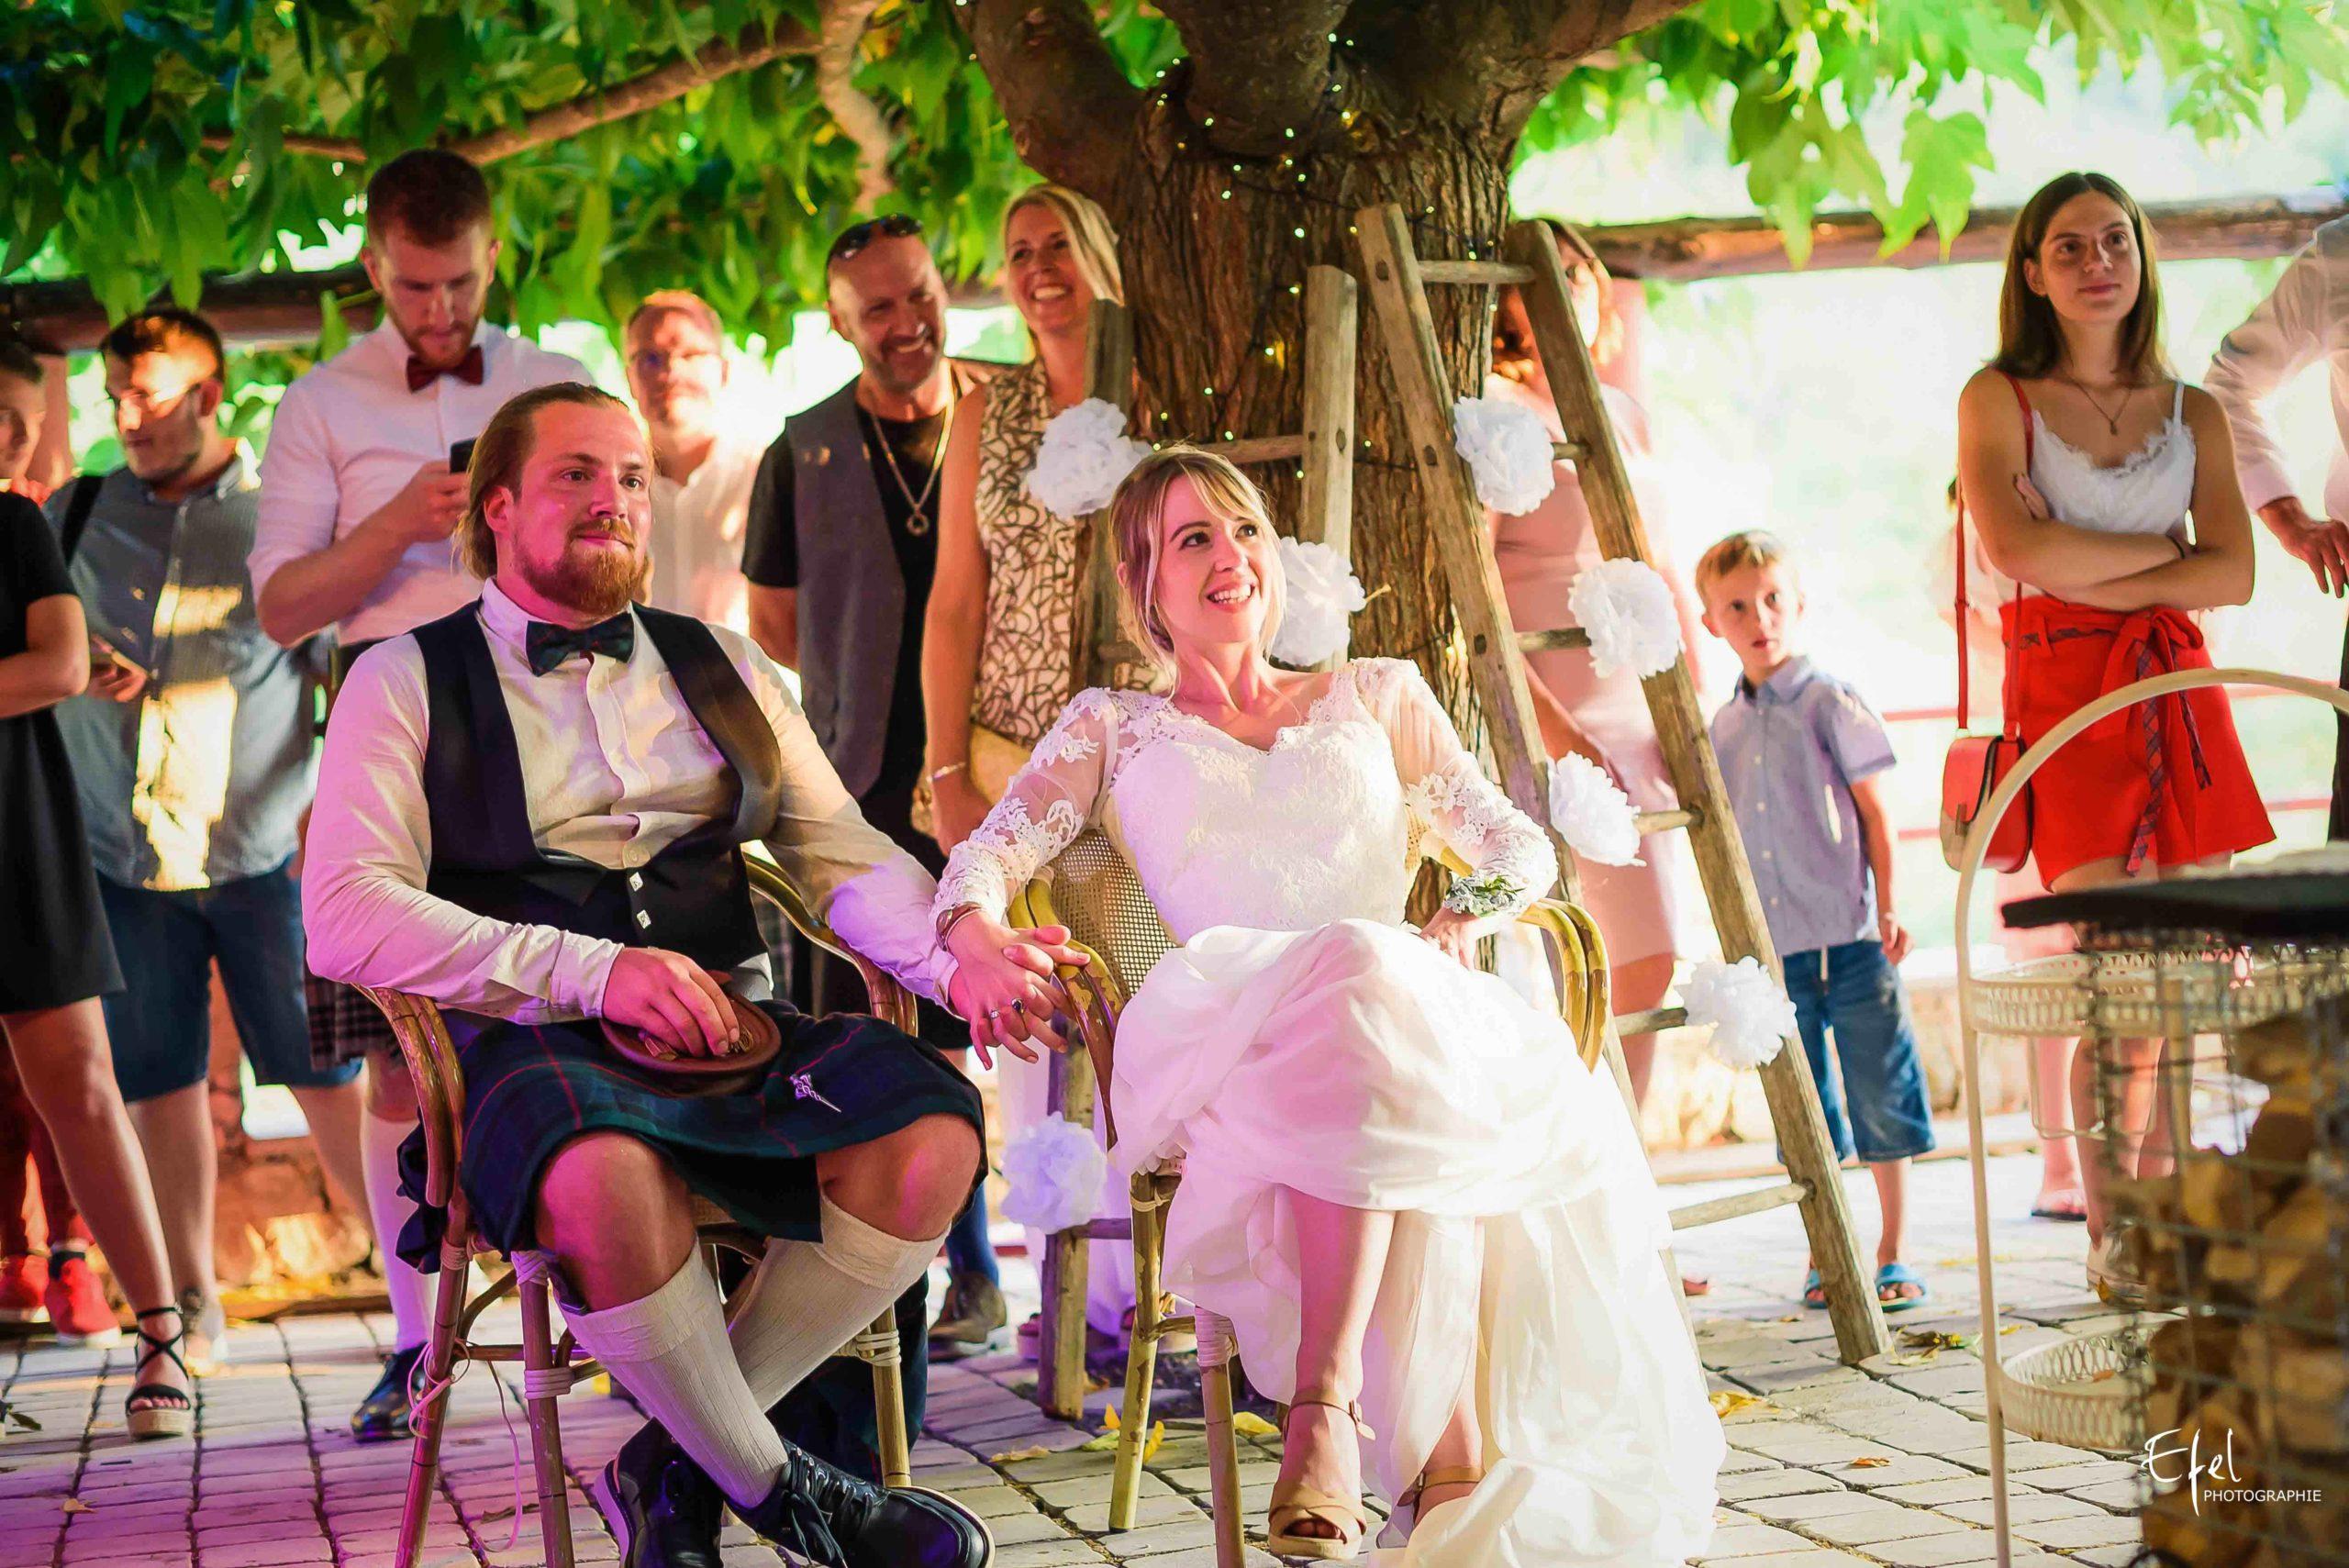 Les photos de la soirée de mariage dans le reportage de mariage